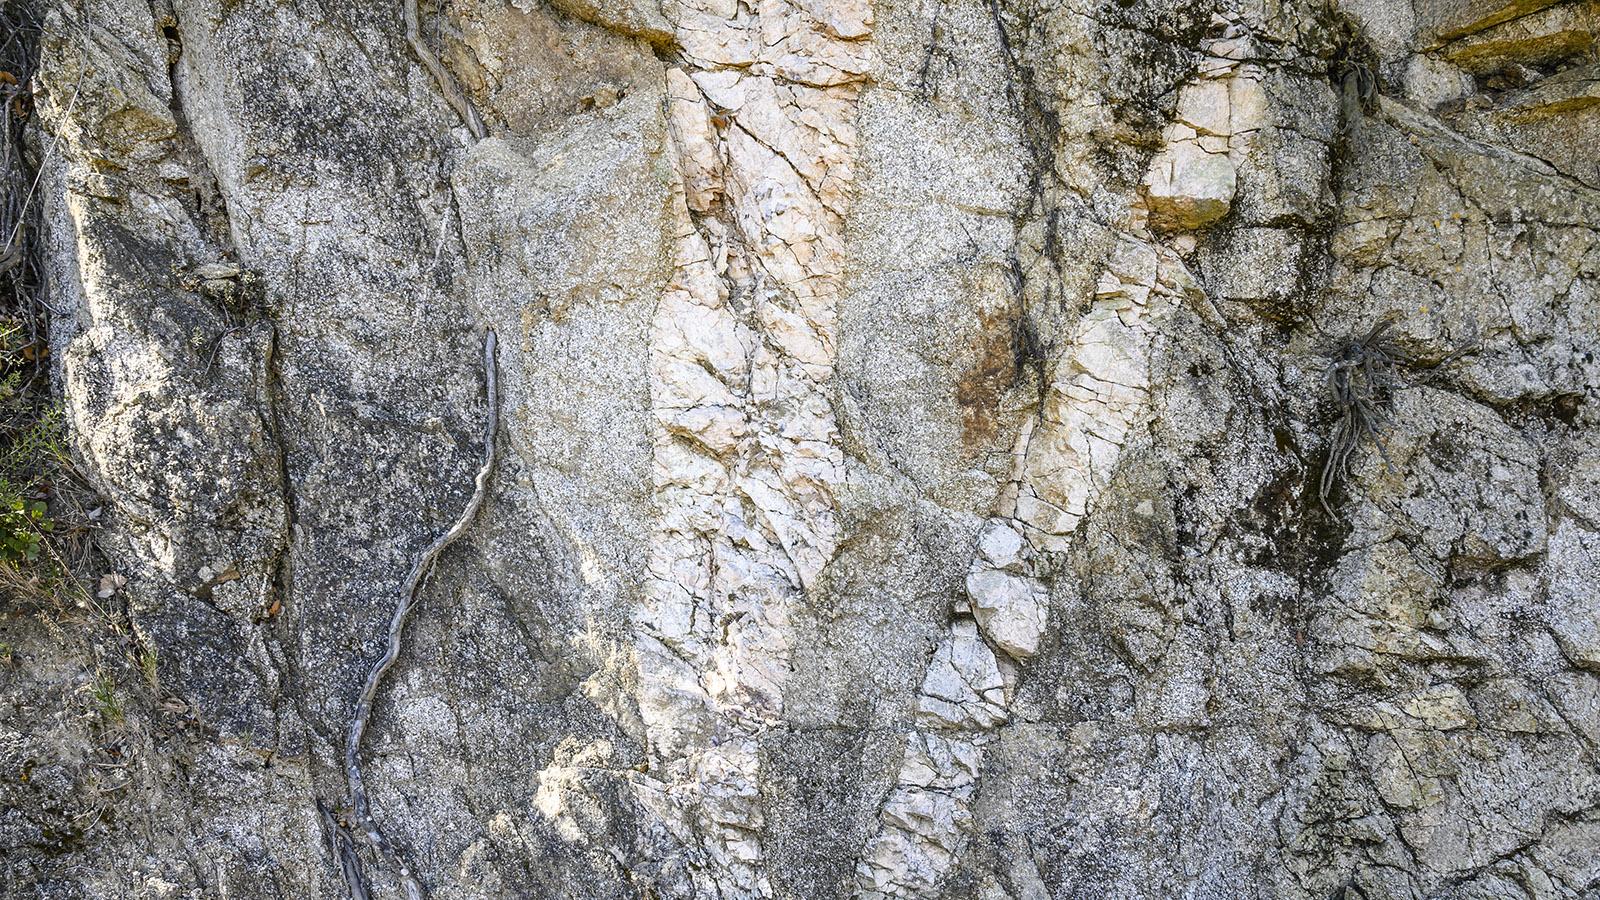 Marmoreinschlüsse im Fels. Foto: Hilke Maunder